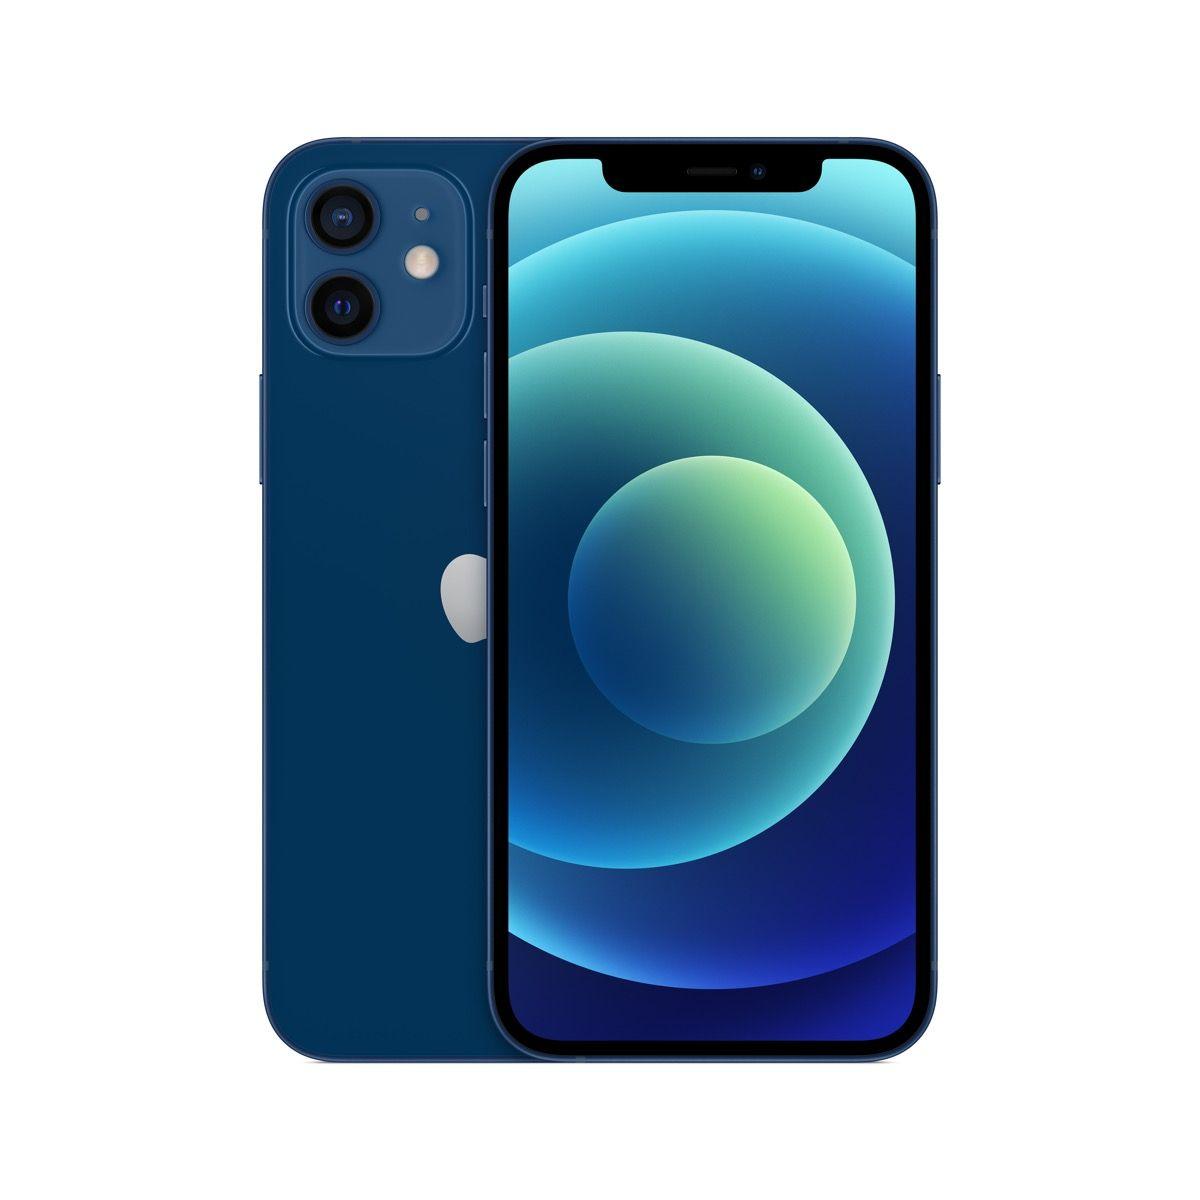 Apple iPhone 12 mini 128GB Blue / SK